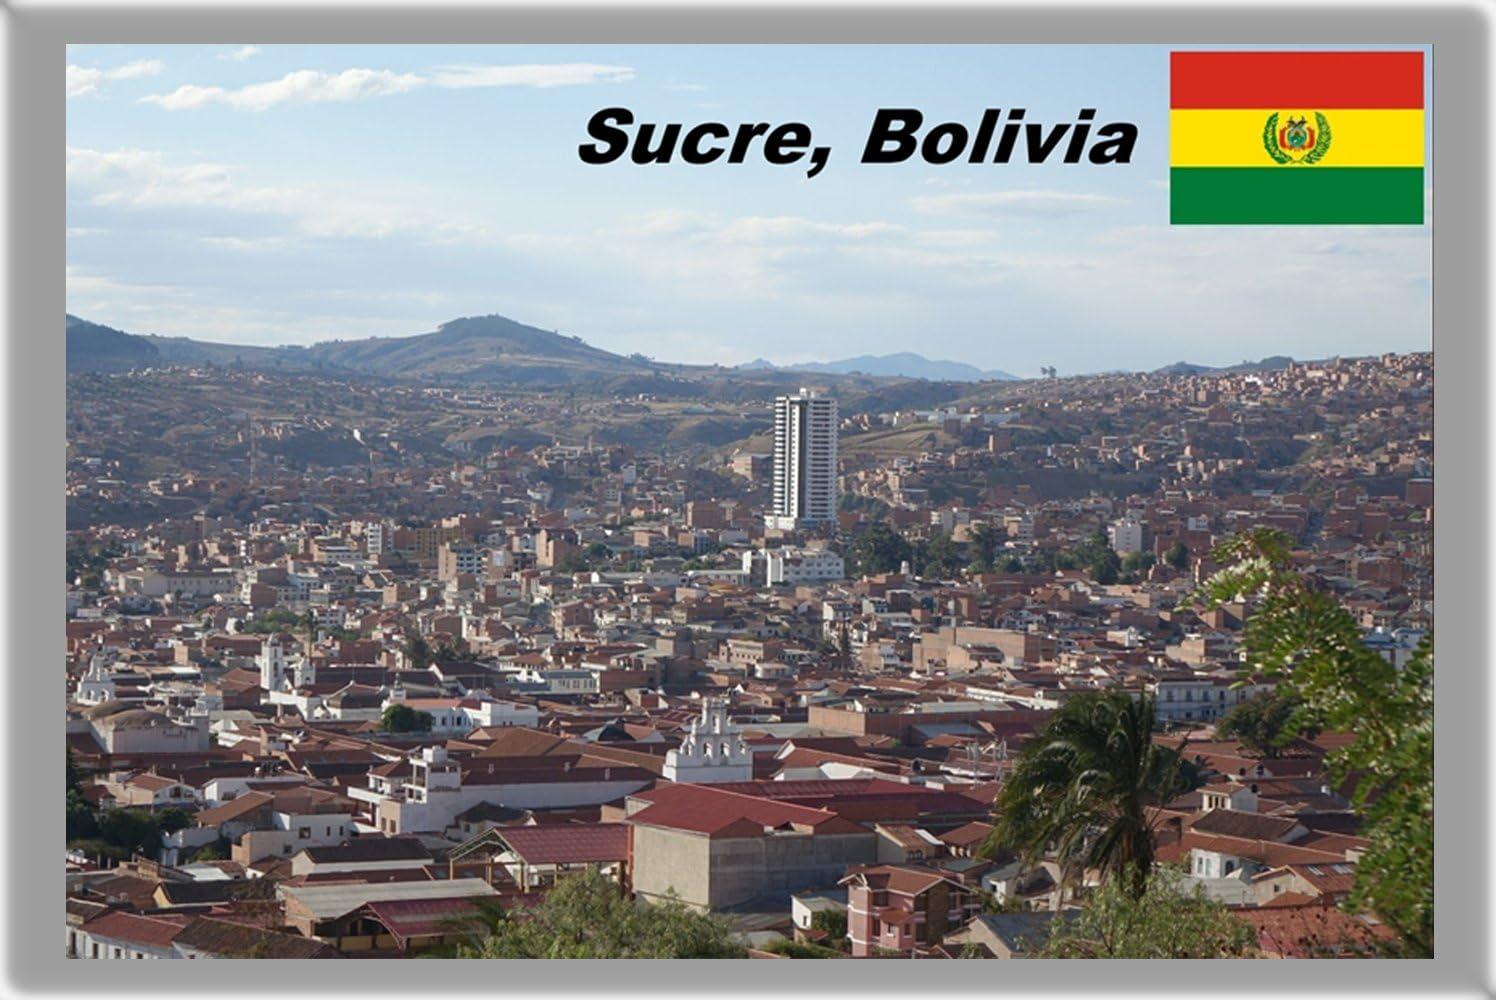 Amazon Com Sucre Refrigerator Magnet Fridge Magnet The Capital City Of Bolivia Refrigerator Magnet Home Kitchen